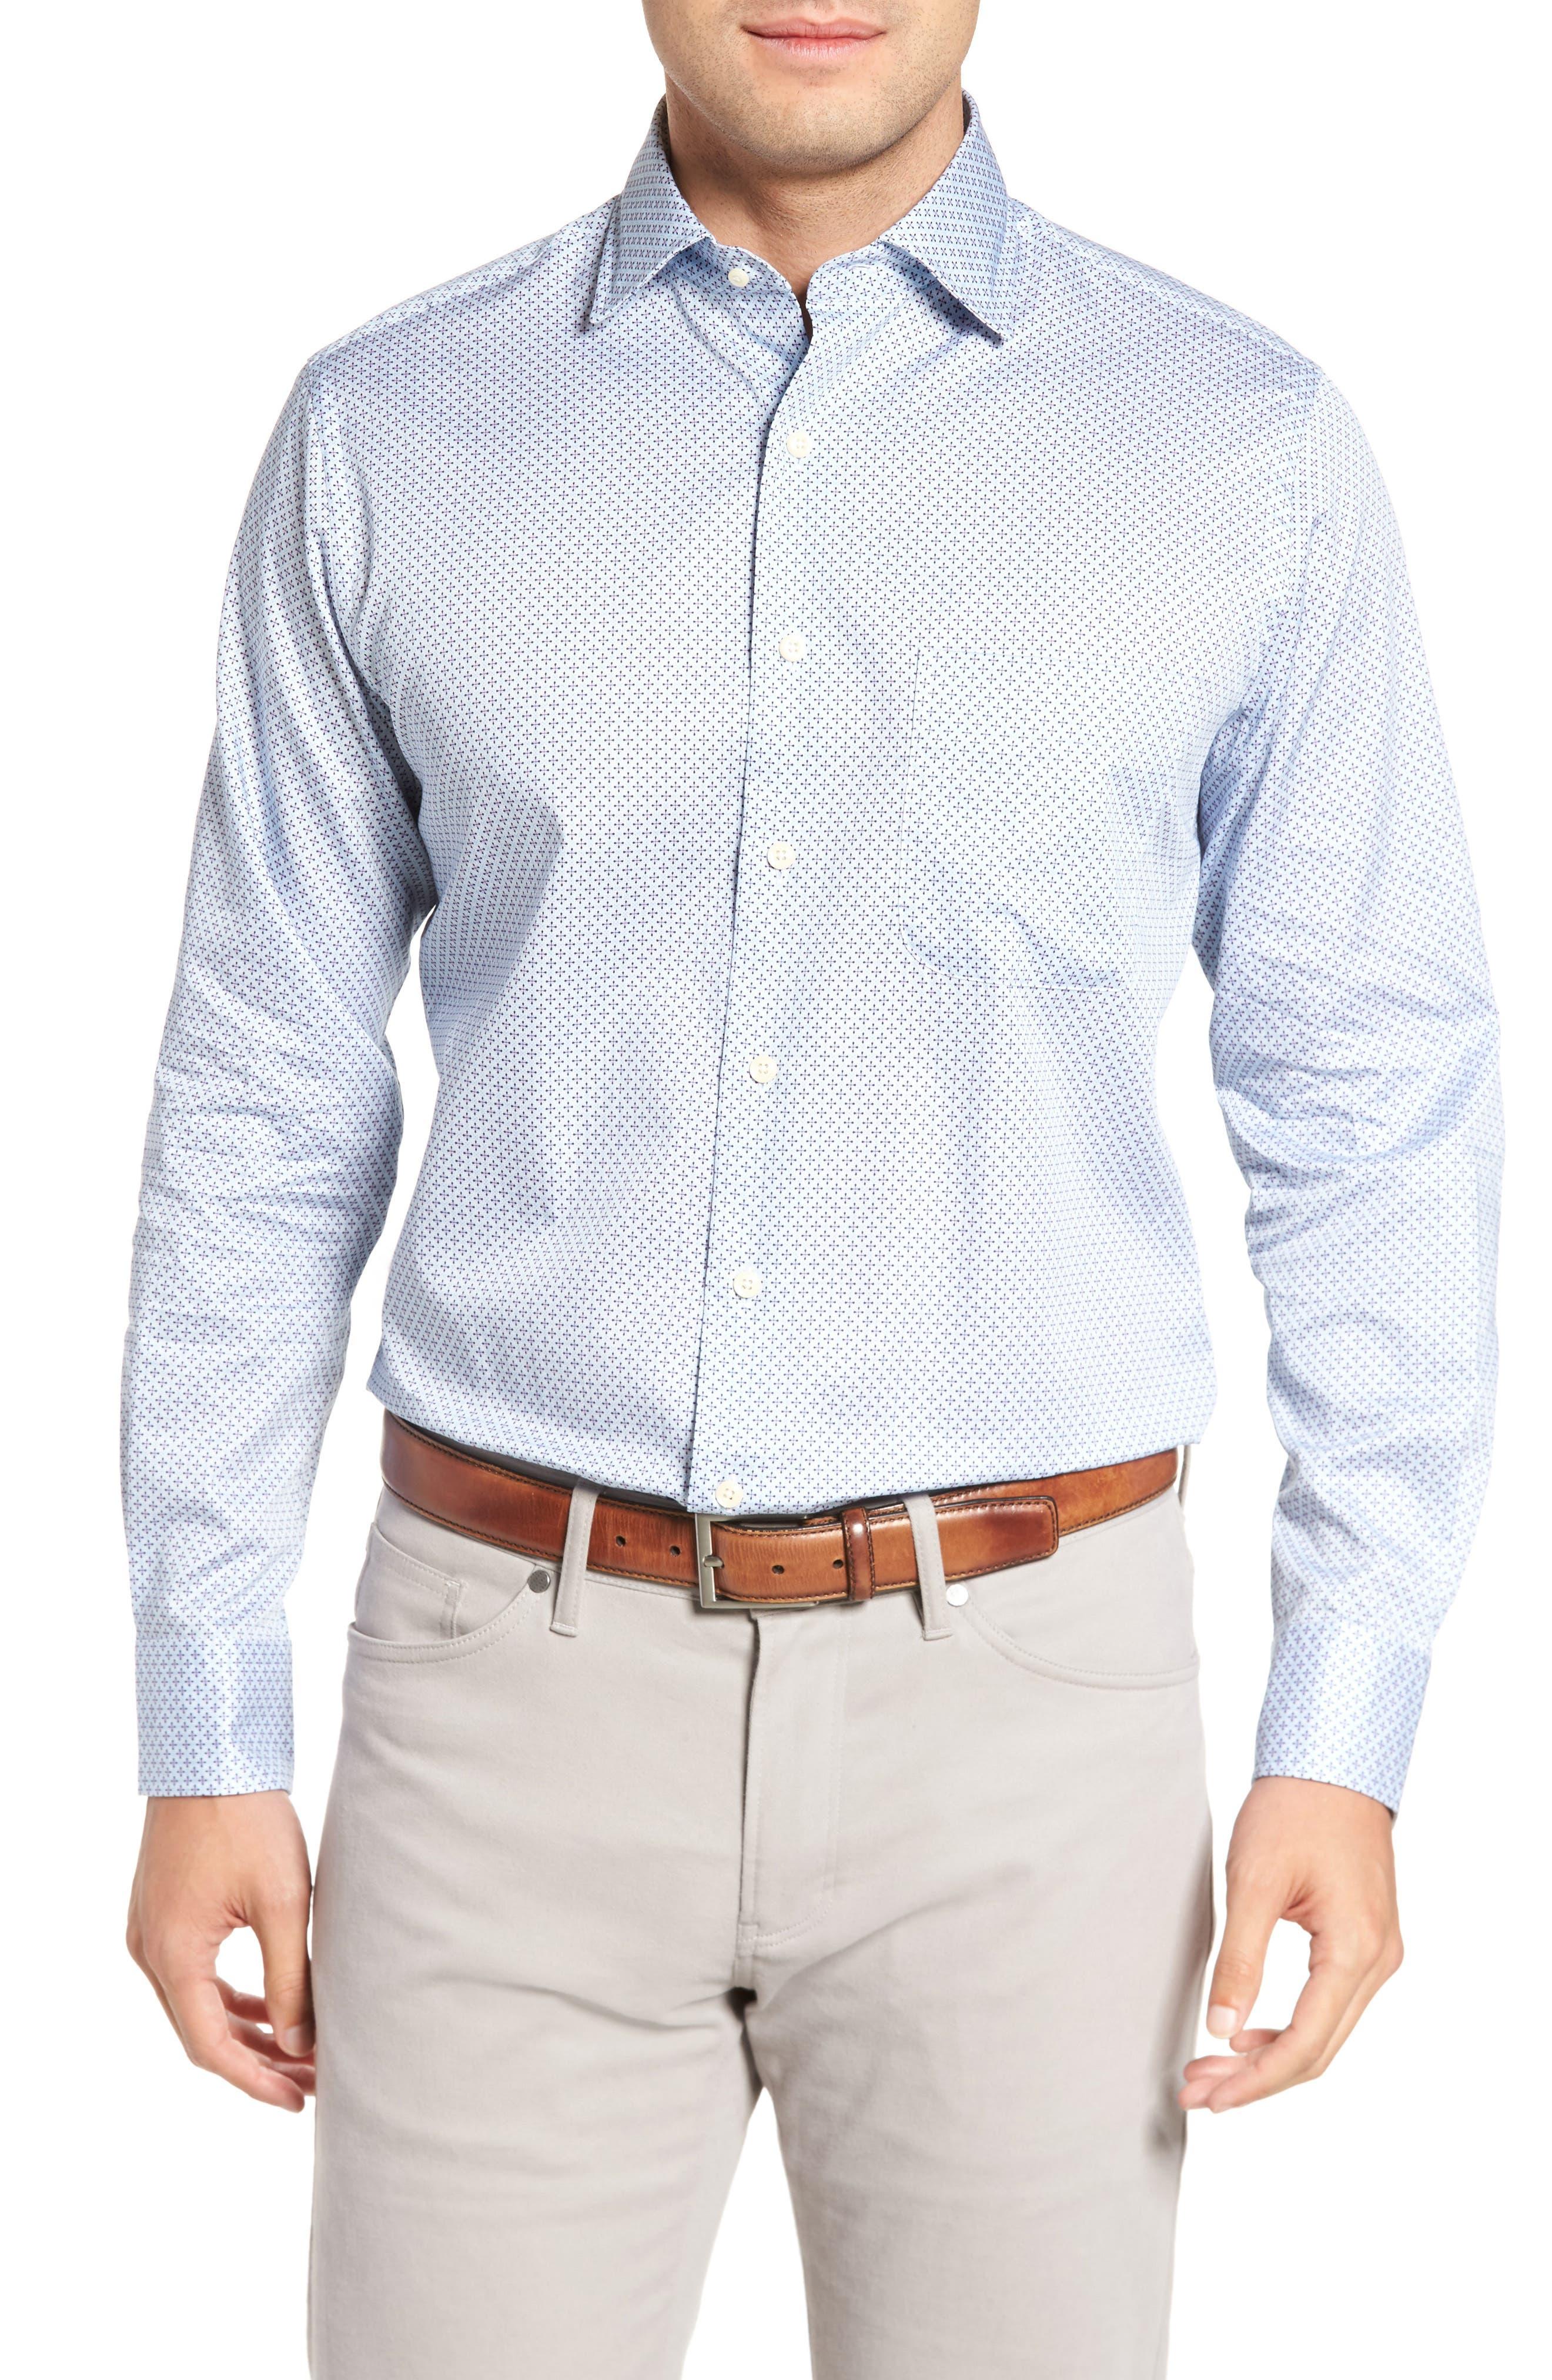 Alternate Image 1 Selected - Peter Millar Flashback Classic Fit Print Sport Shirt